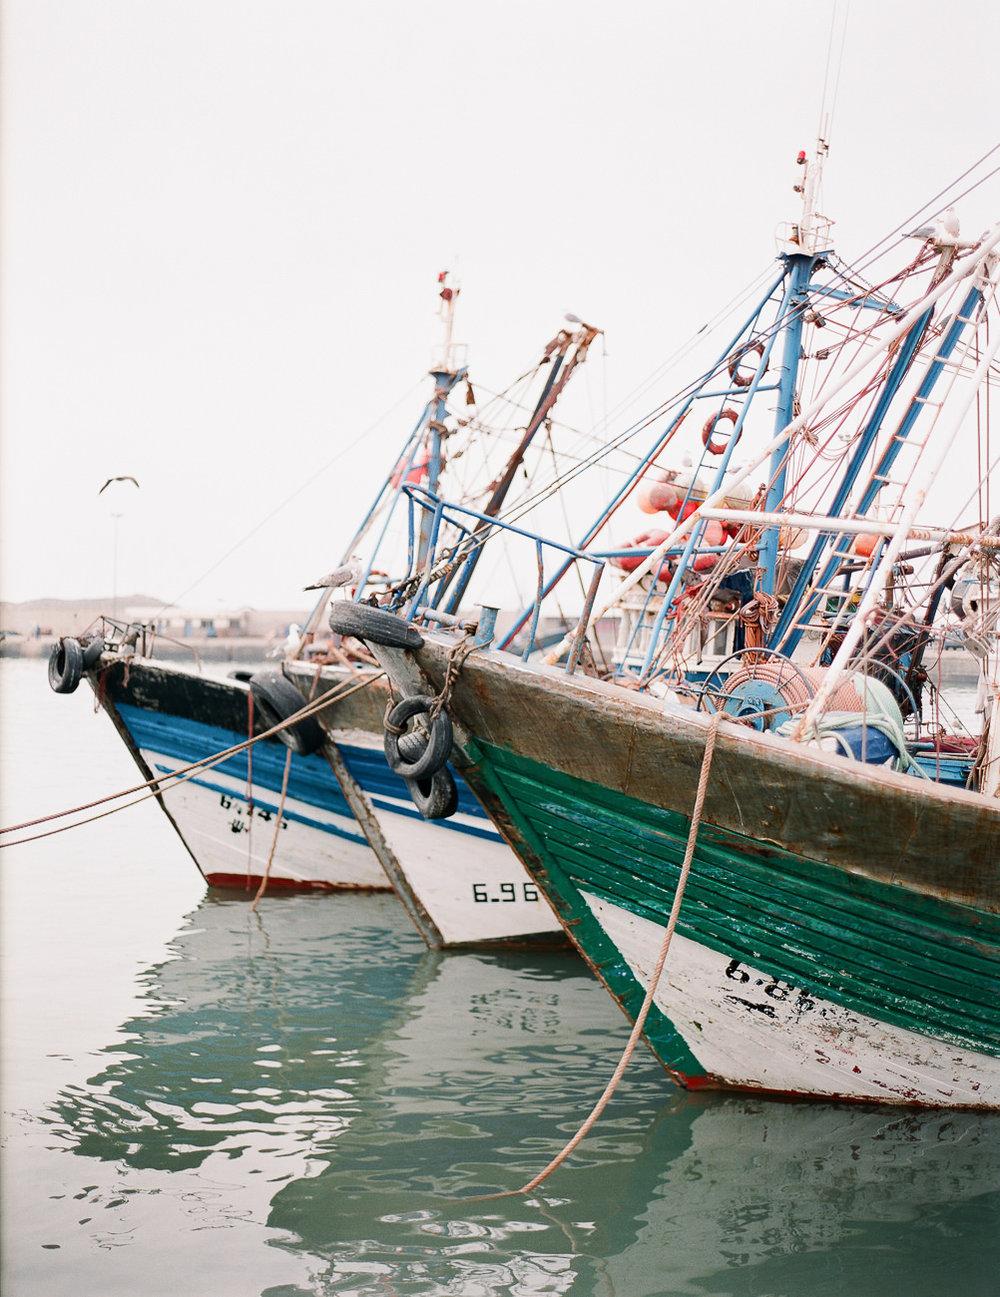 marrakech-photographe-voyage-alain-m-5.jpg